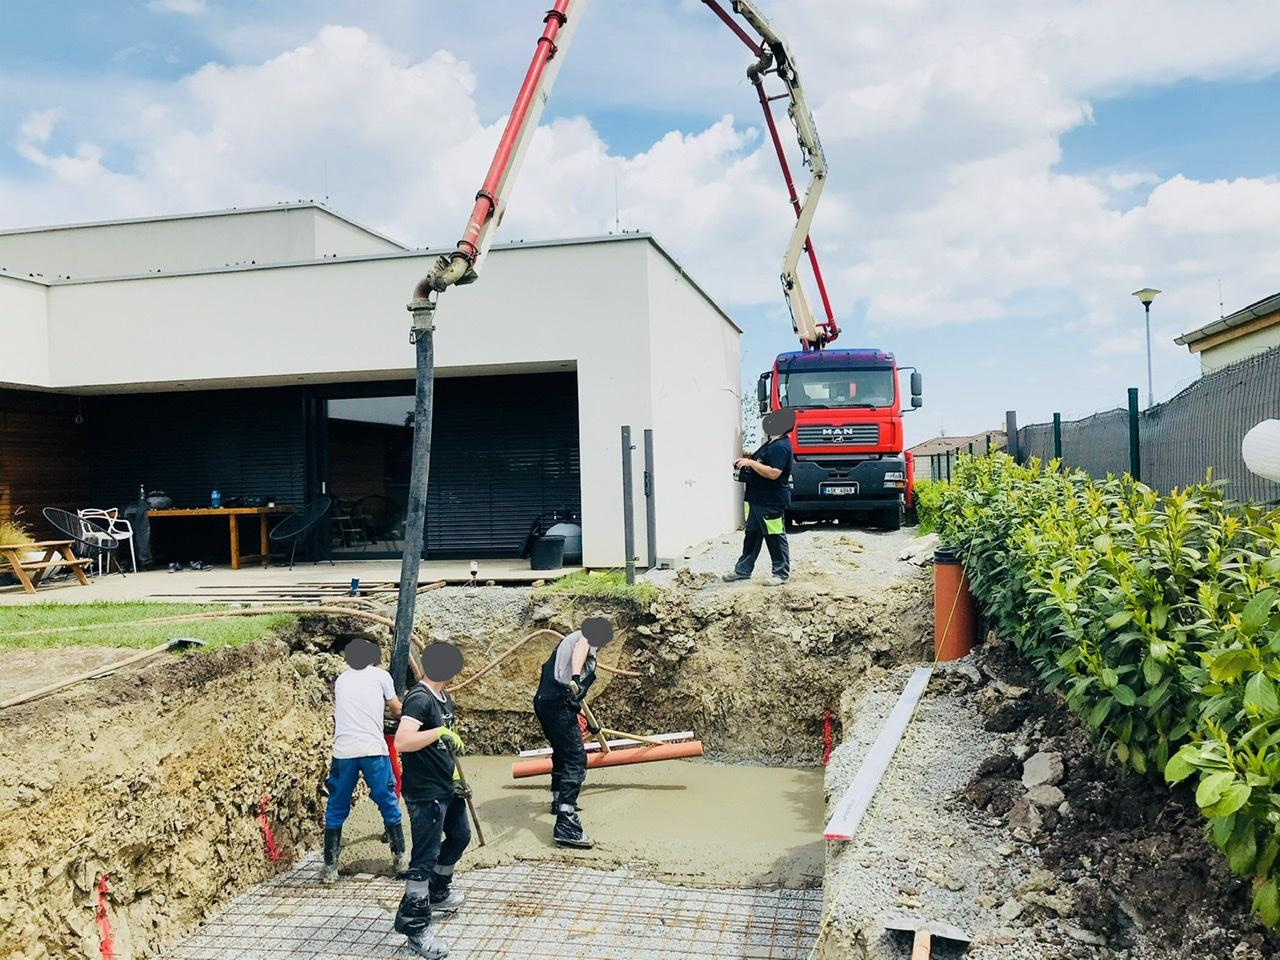 Naše L-ko - 2021 - stále dokončujeme - Deň 5. - dorazila betonpumpa a betonuje sa základová doska bazéna